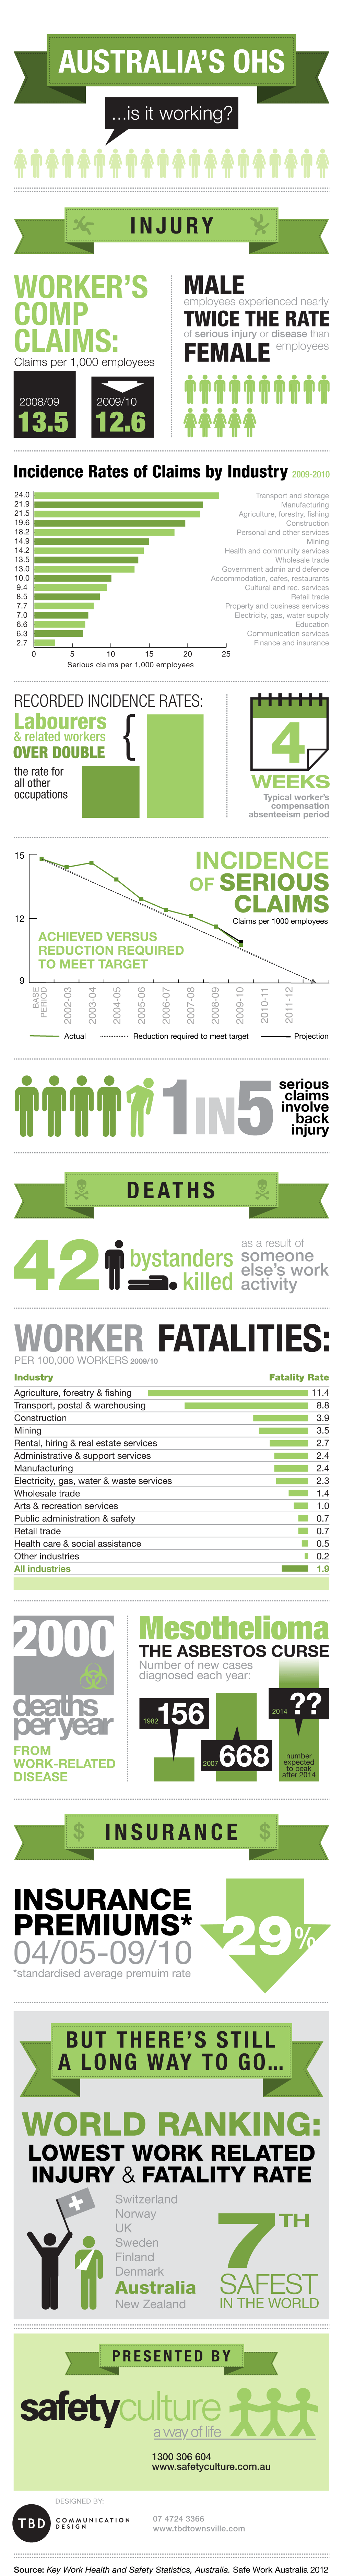 safe-work-statistics-australia-1000.png